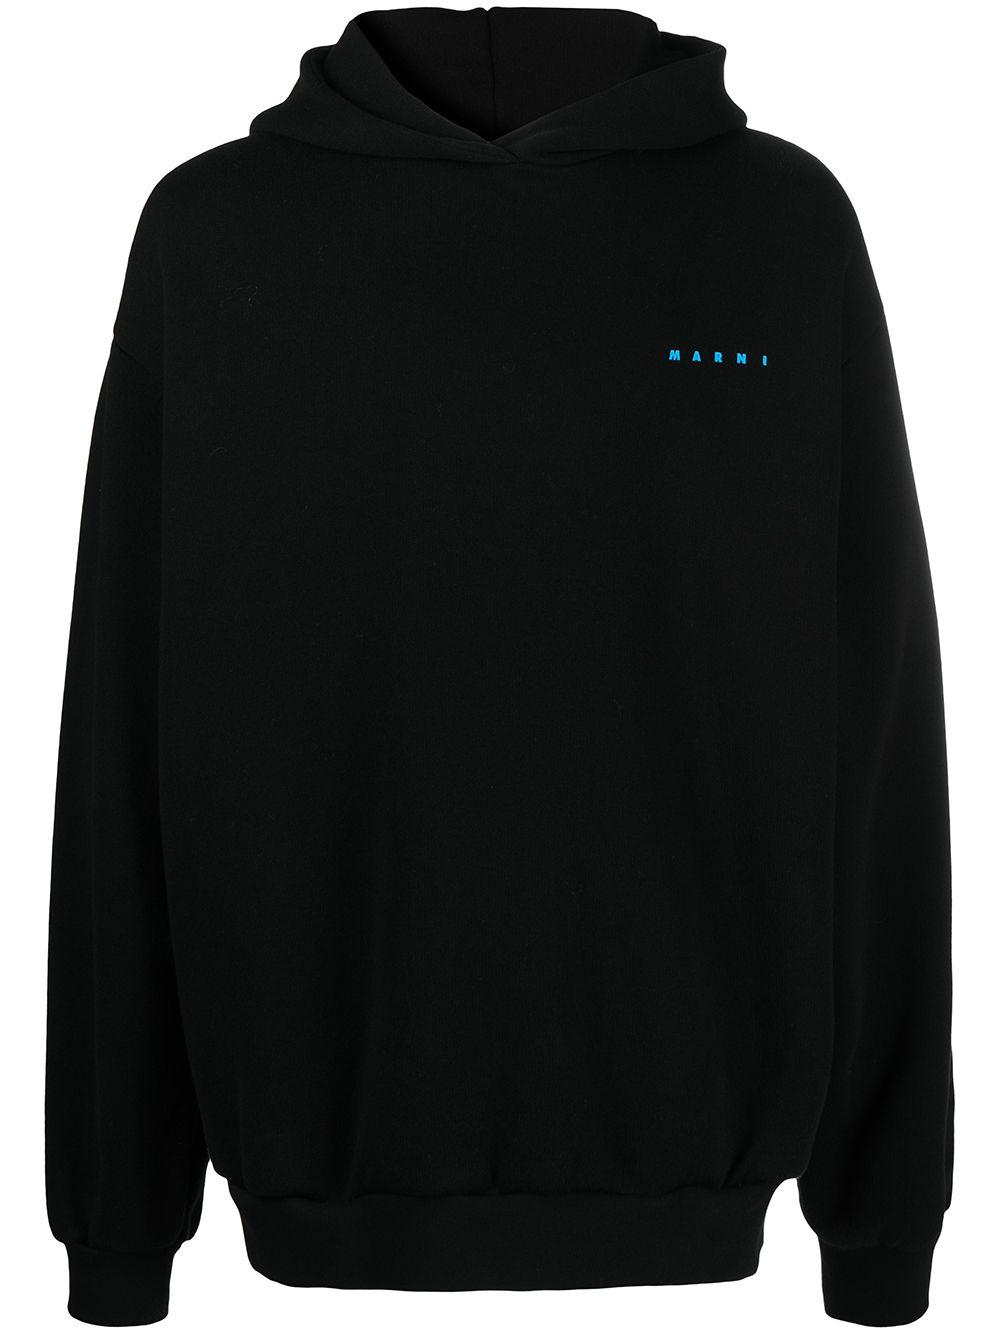 felpa con logo uomo nera in cotone MARNI   Felpe   FUMU0067P0 UTC02200N99